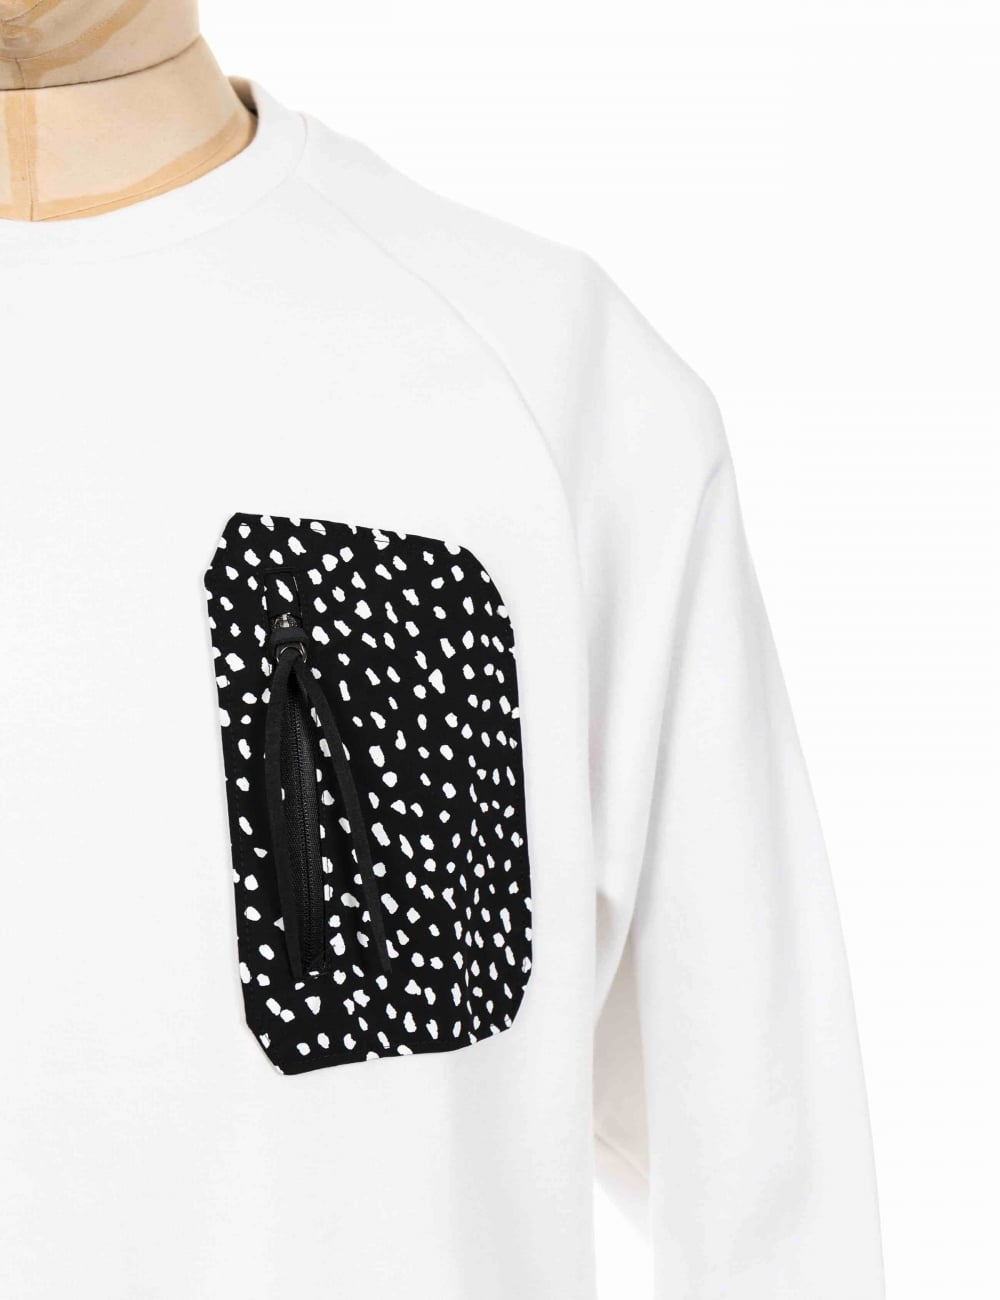 caf2dfbf4d35d Adidas Originals NMD Pocket Crewneck Sweeatshirt - White - Clothing ...